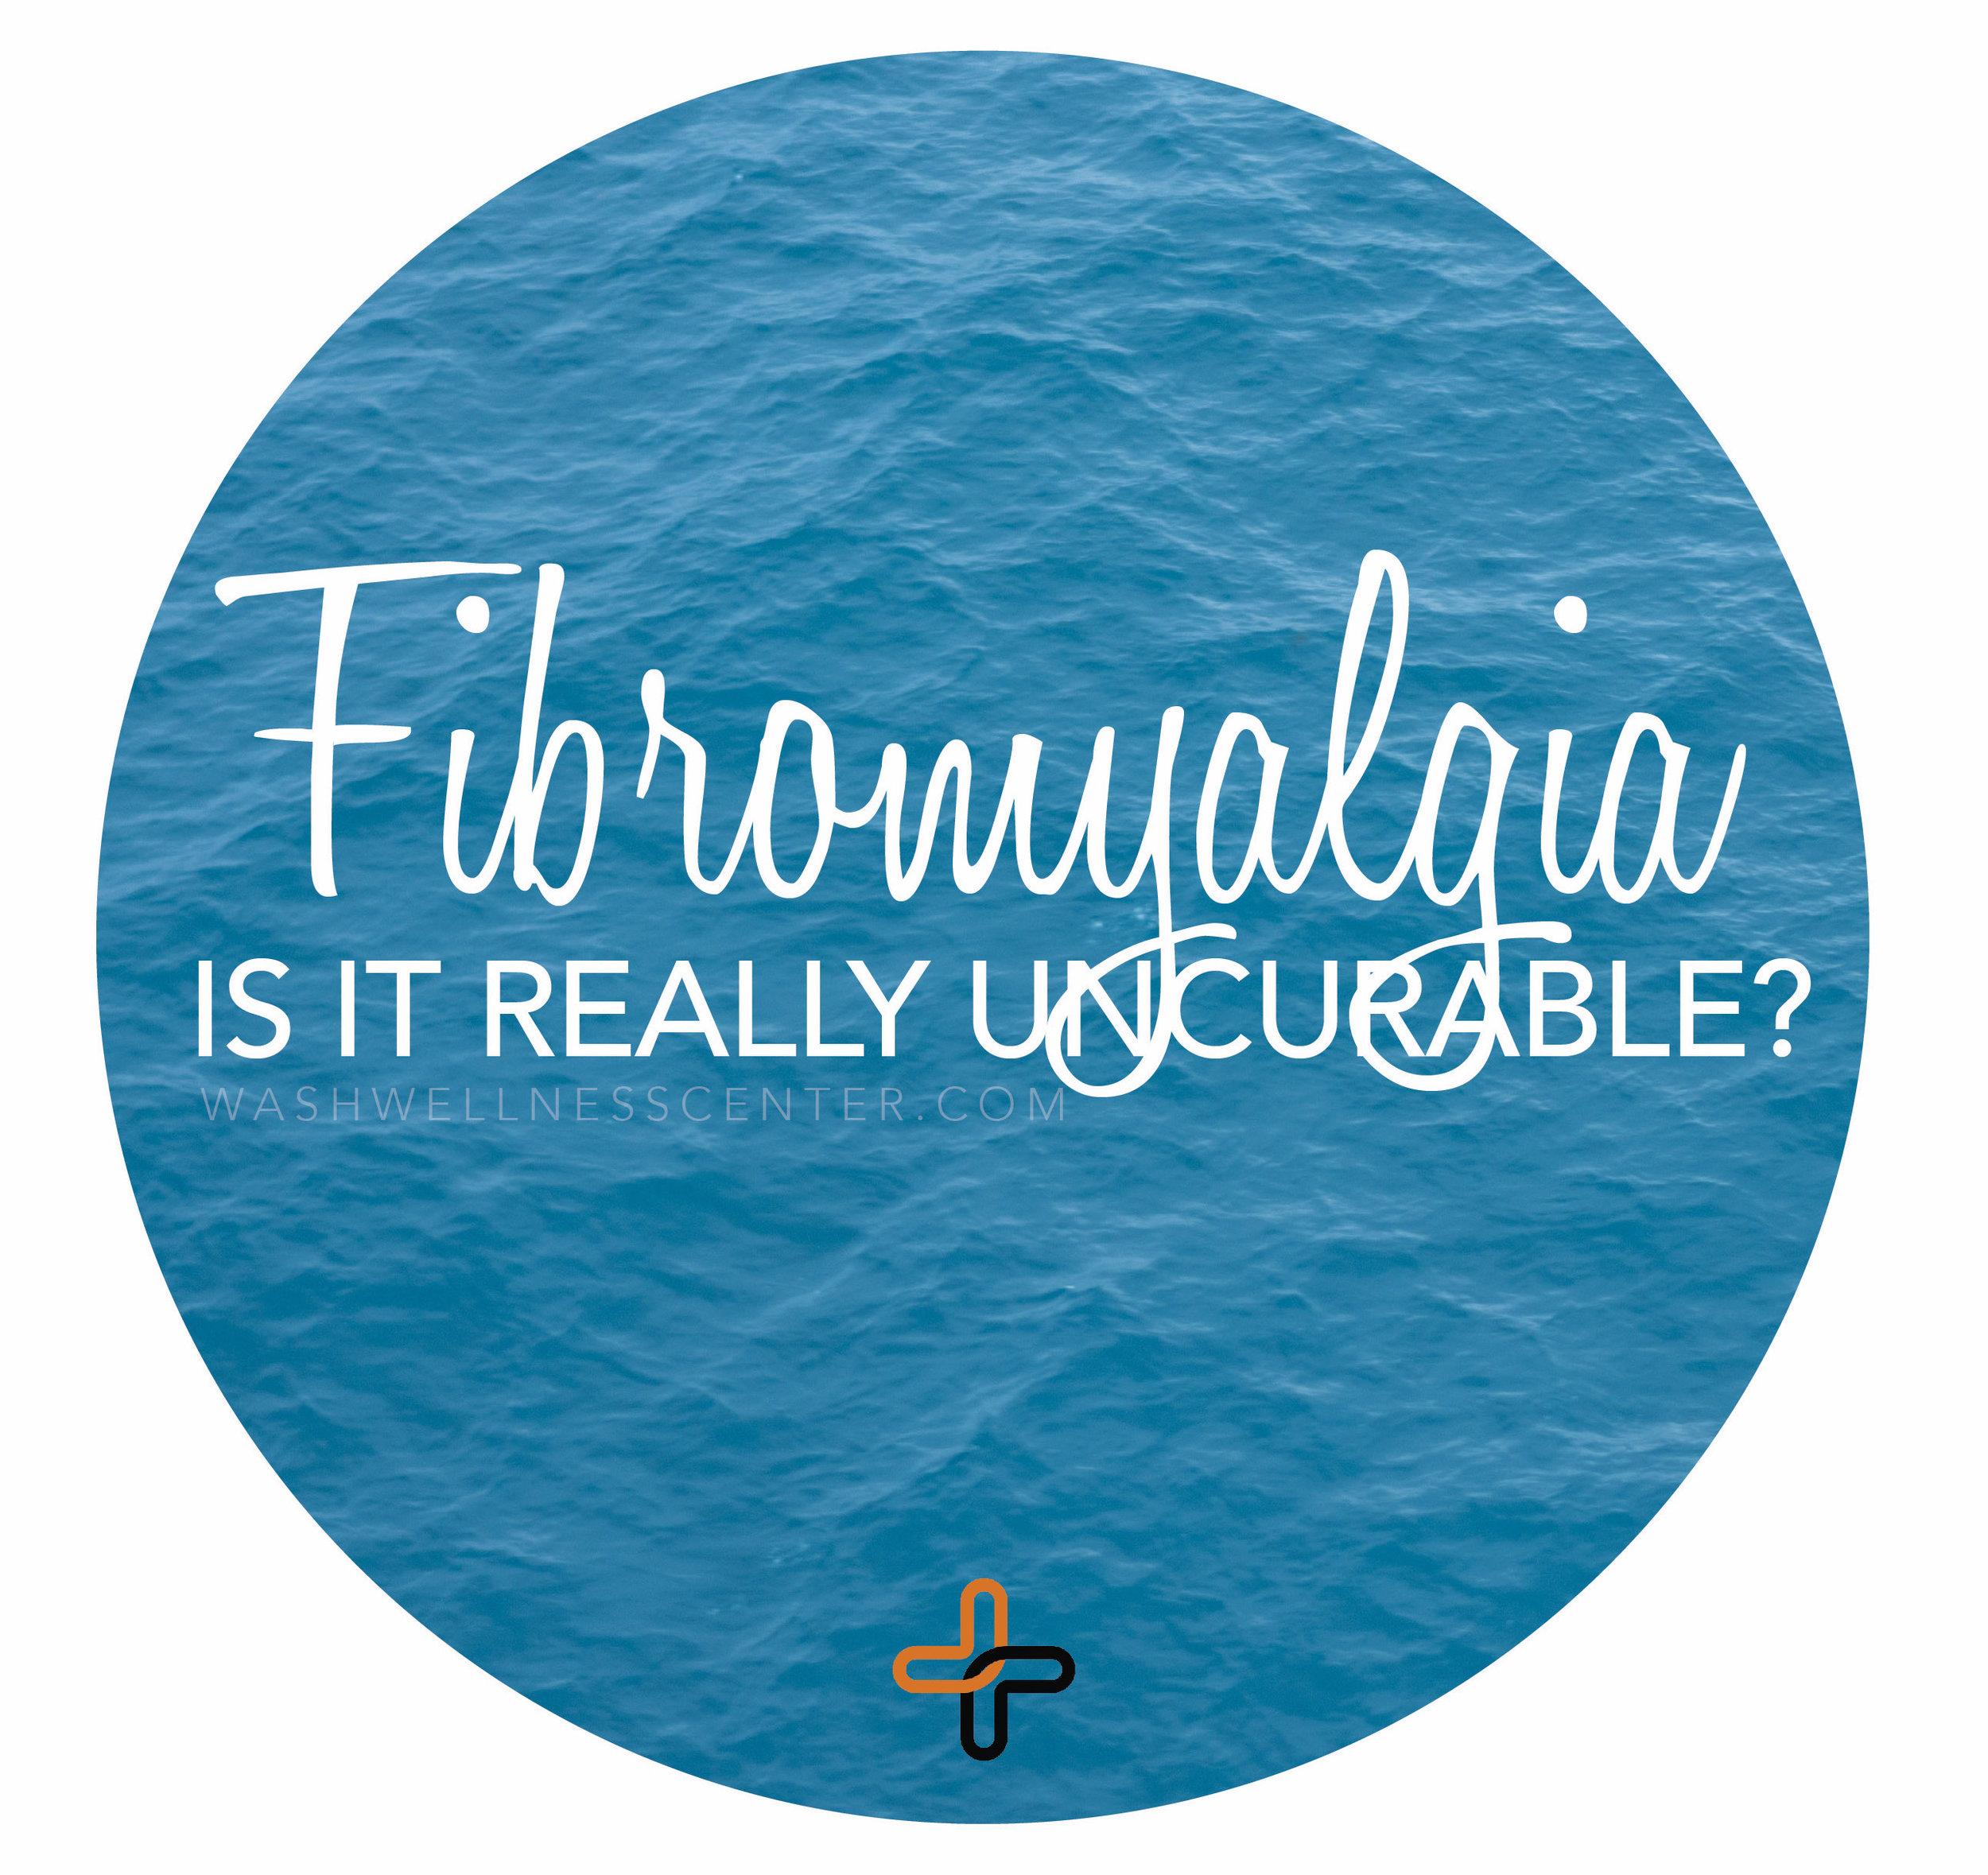 FIBROMYALGIA+IS+IT+REALLY+UNCURABLE.jpg